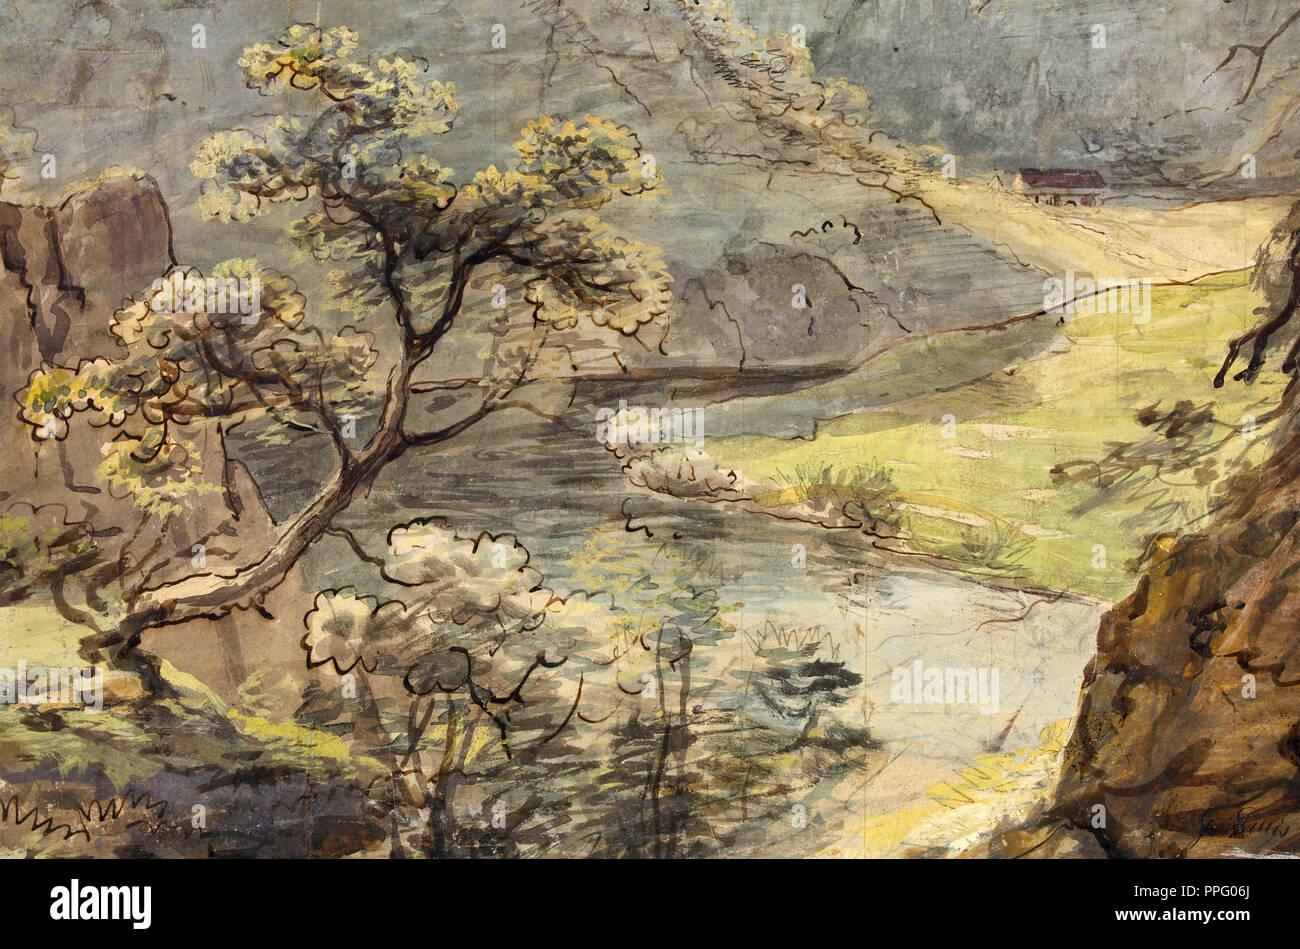 Johann Georg von Dillis - River Landscape. Circa 1820. Watercolor and gouache over graphite. The J. Paul Getty Museum, Los Angeles, USA. - Stock Image